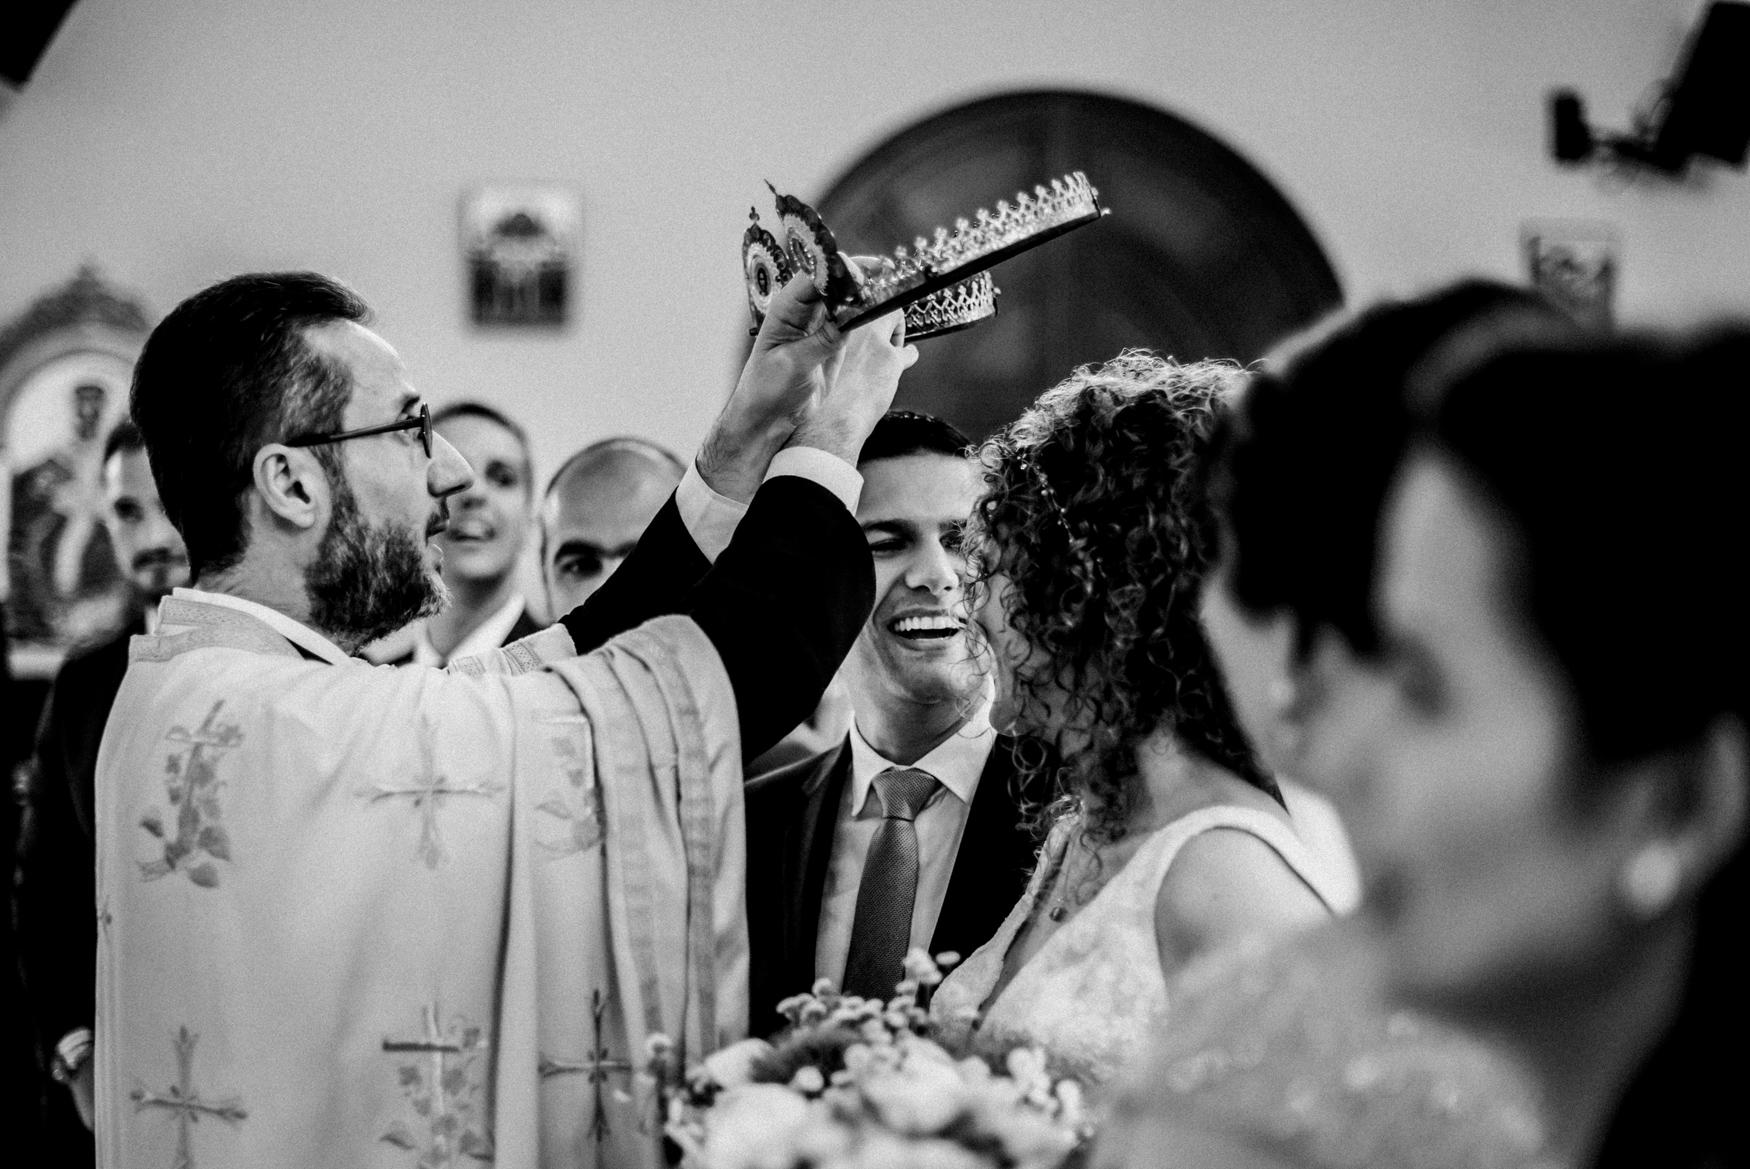 LR3 byblos beirut church wedding ceremony lebanon 008.jpg